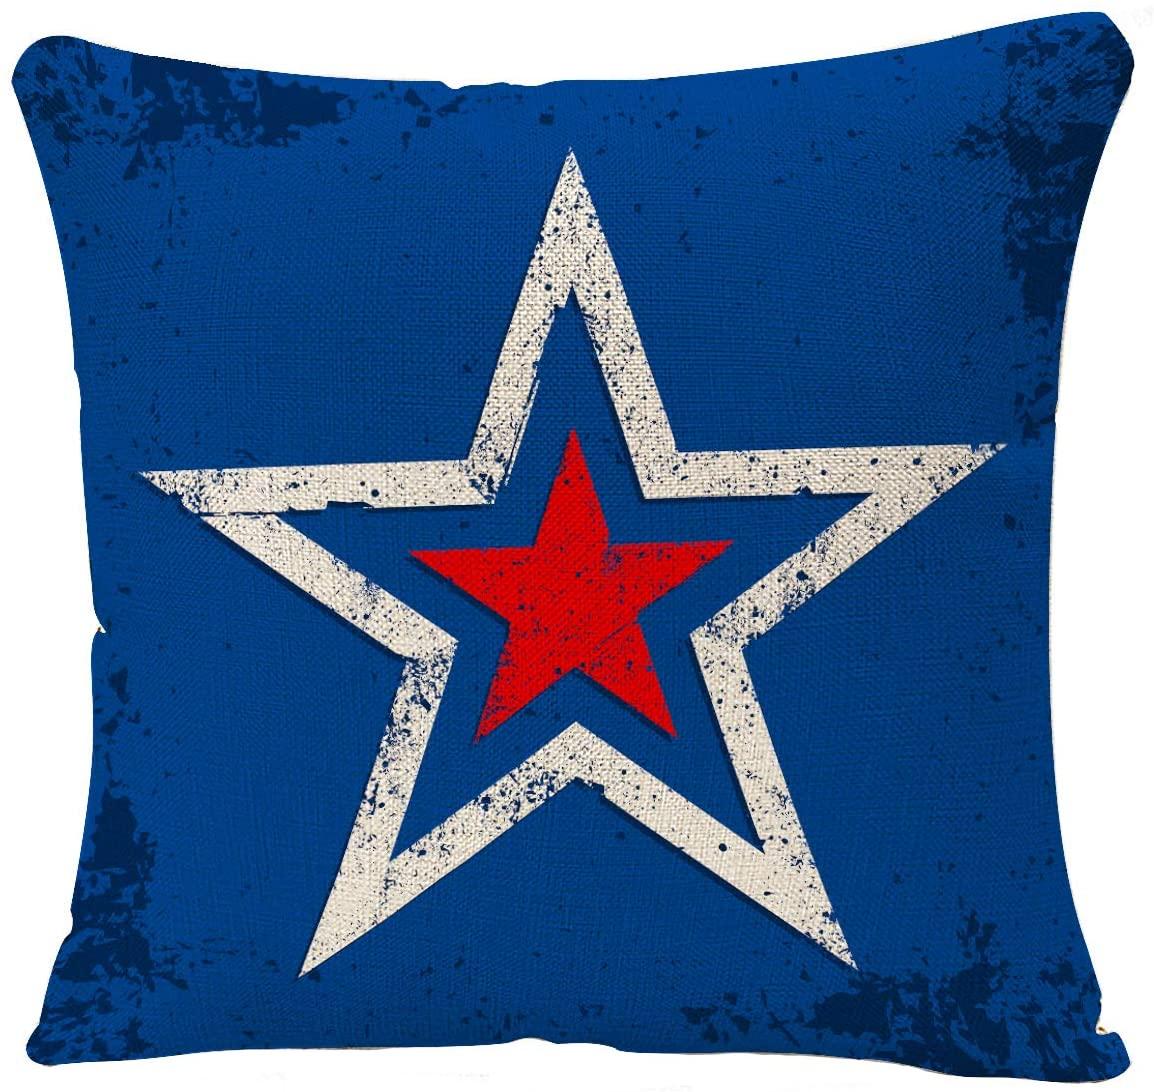 YGGQF Throw Pillow Cover Vintage America Home Decor Us Star Decorative Pillow Cushion Cover Kitchen Garden Sofa Bedroom Car Living Room Pillowcase 18 x 18 Inch